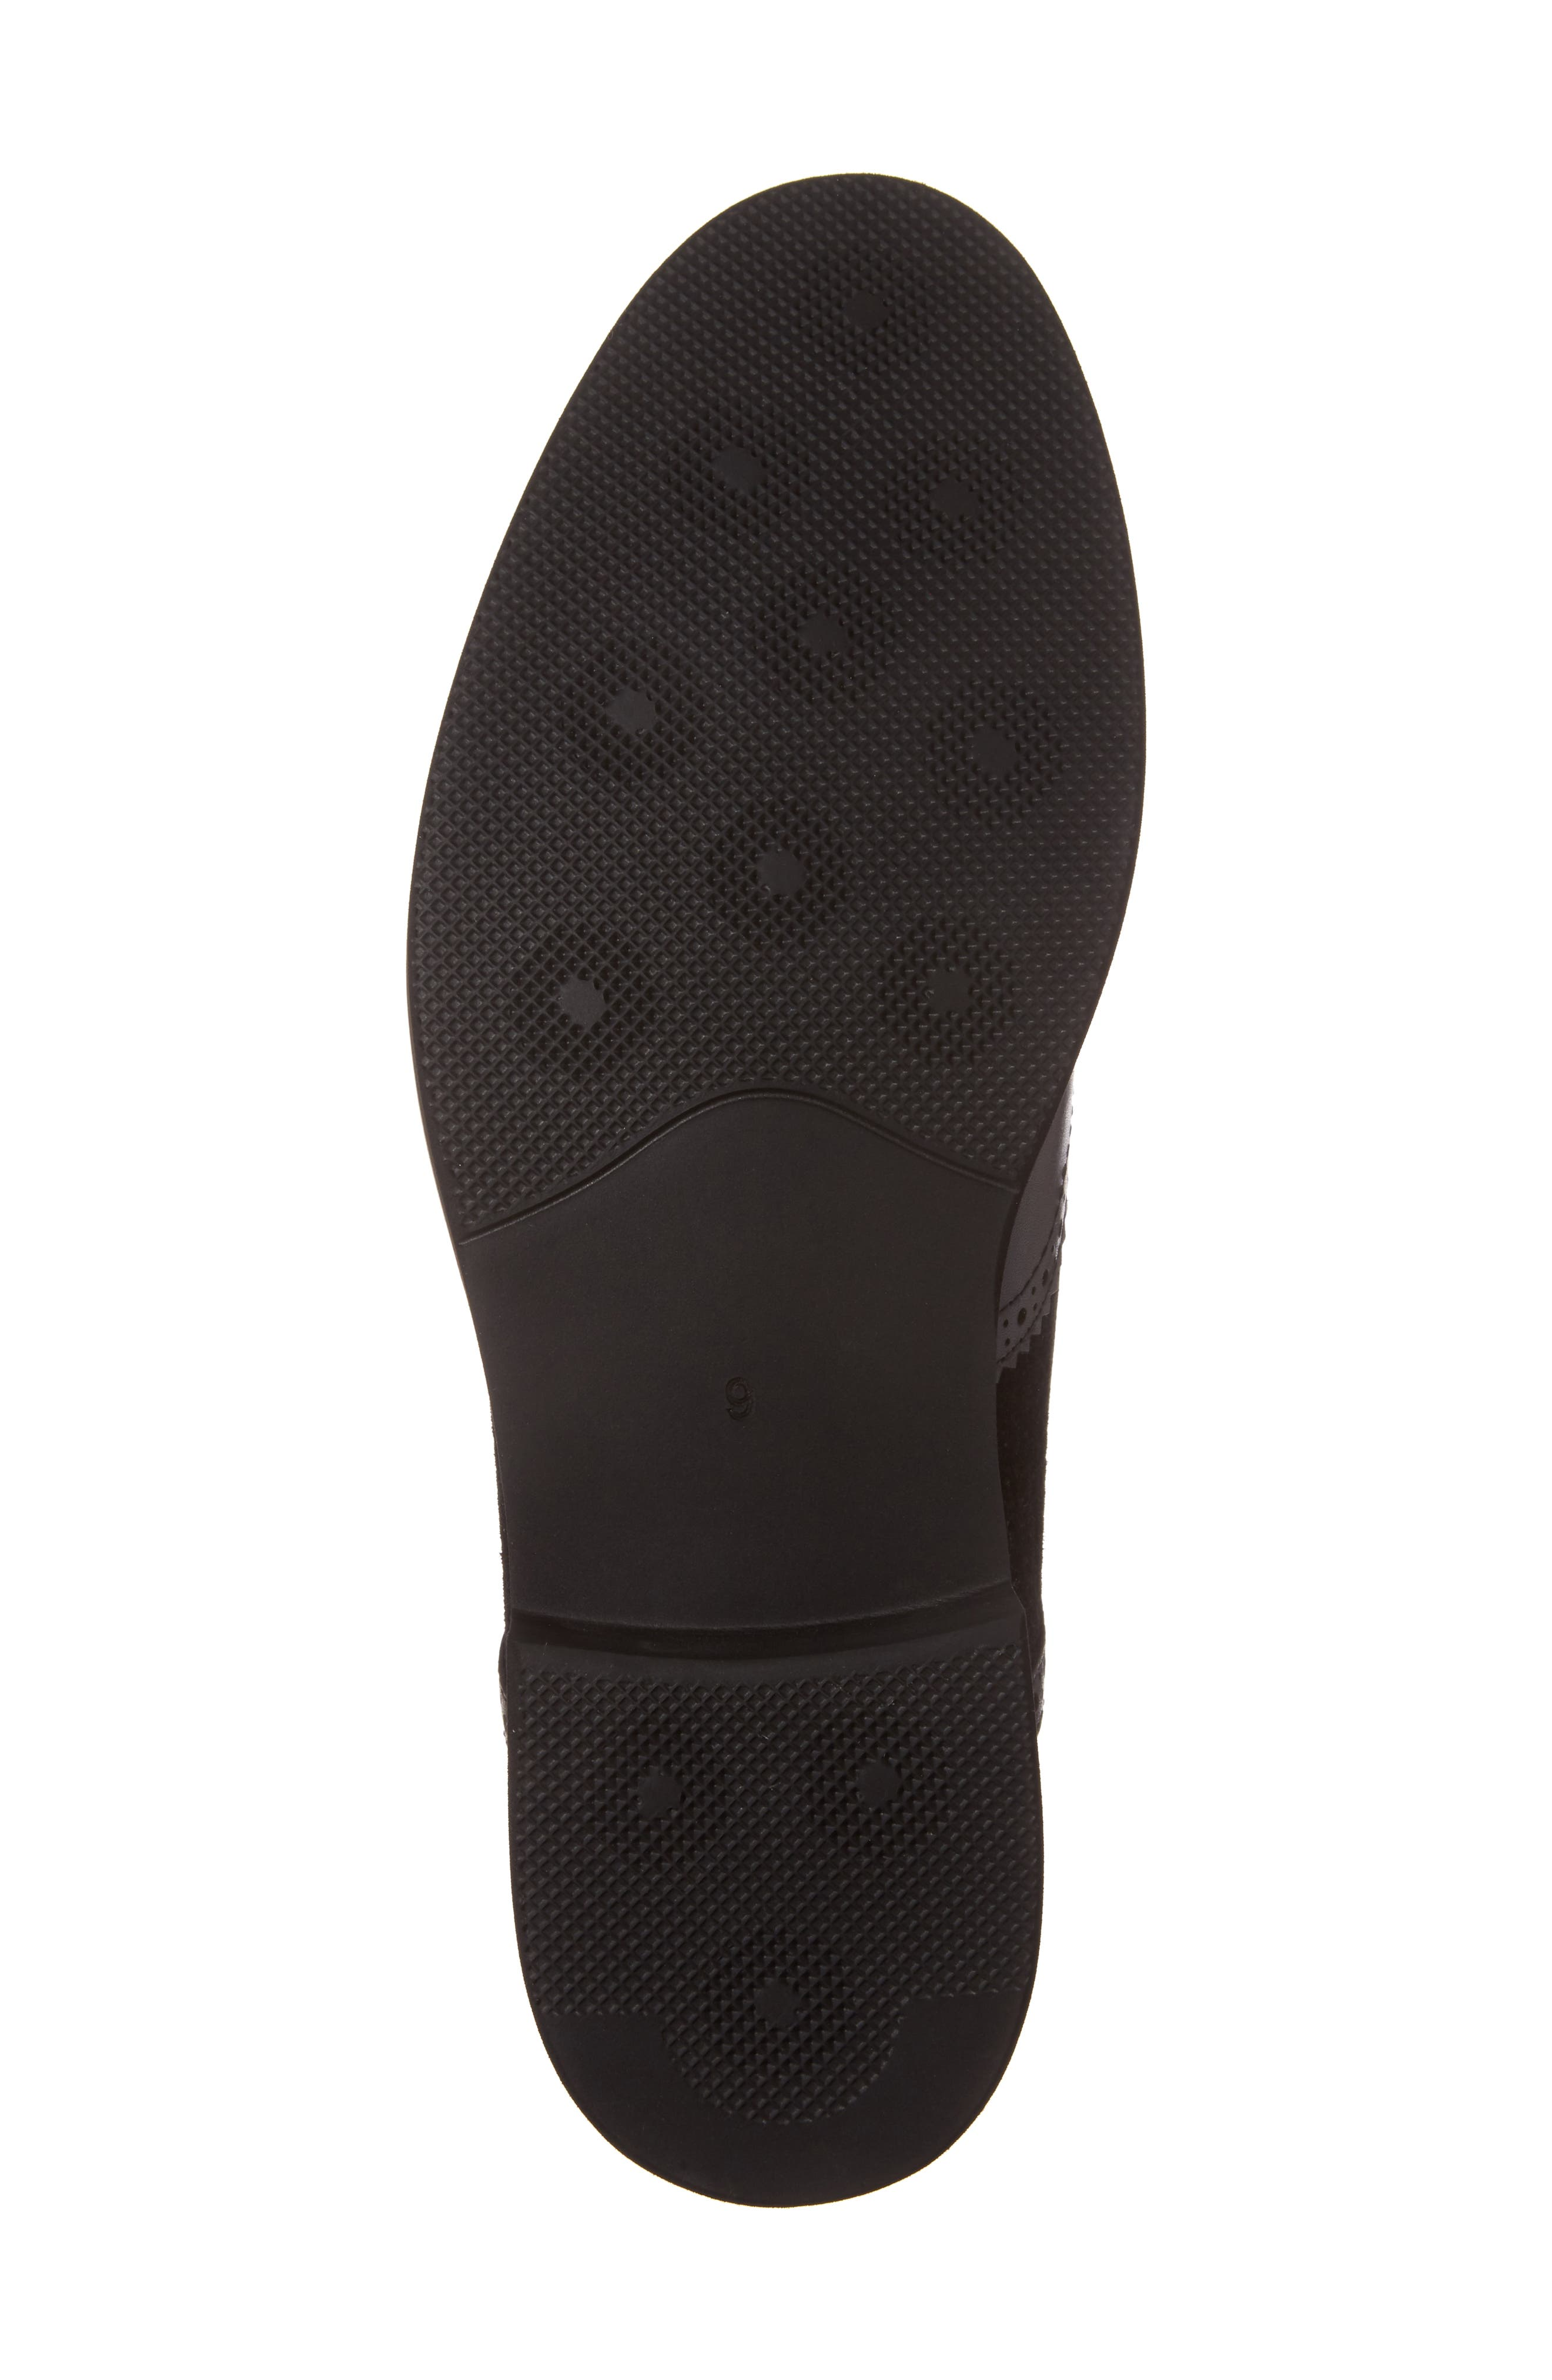 Maritime Spectator Shoe,                             Alternate thumbnail 6, color,                             Black Leather